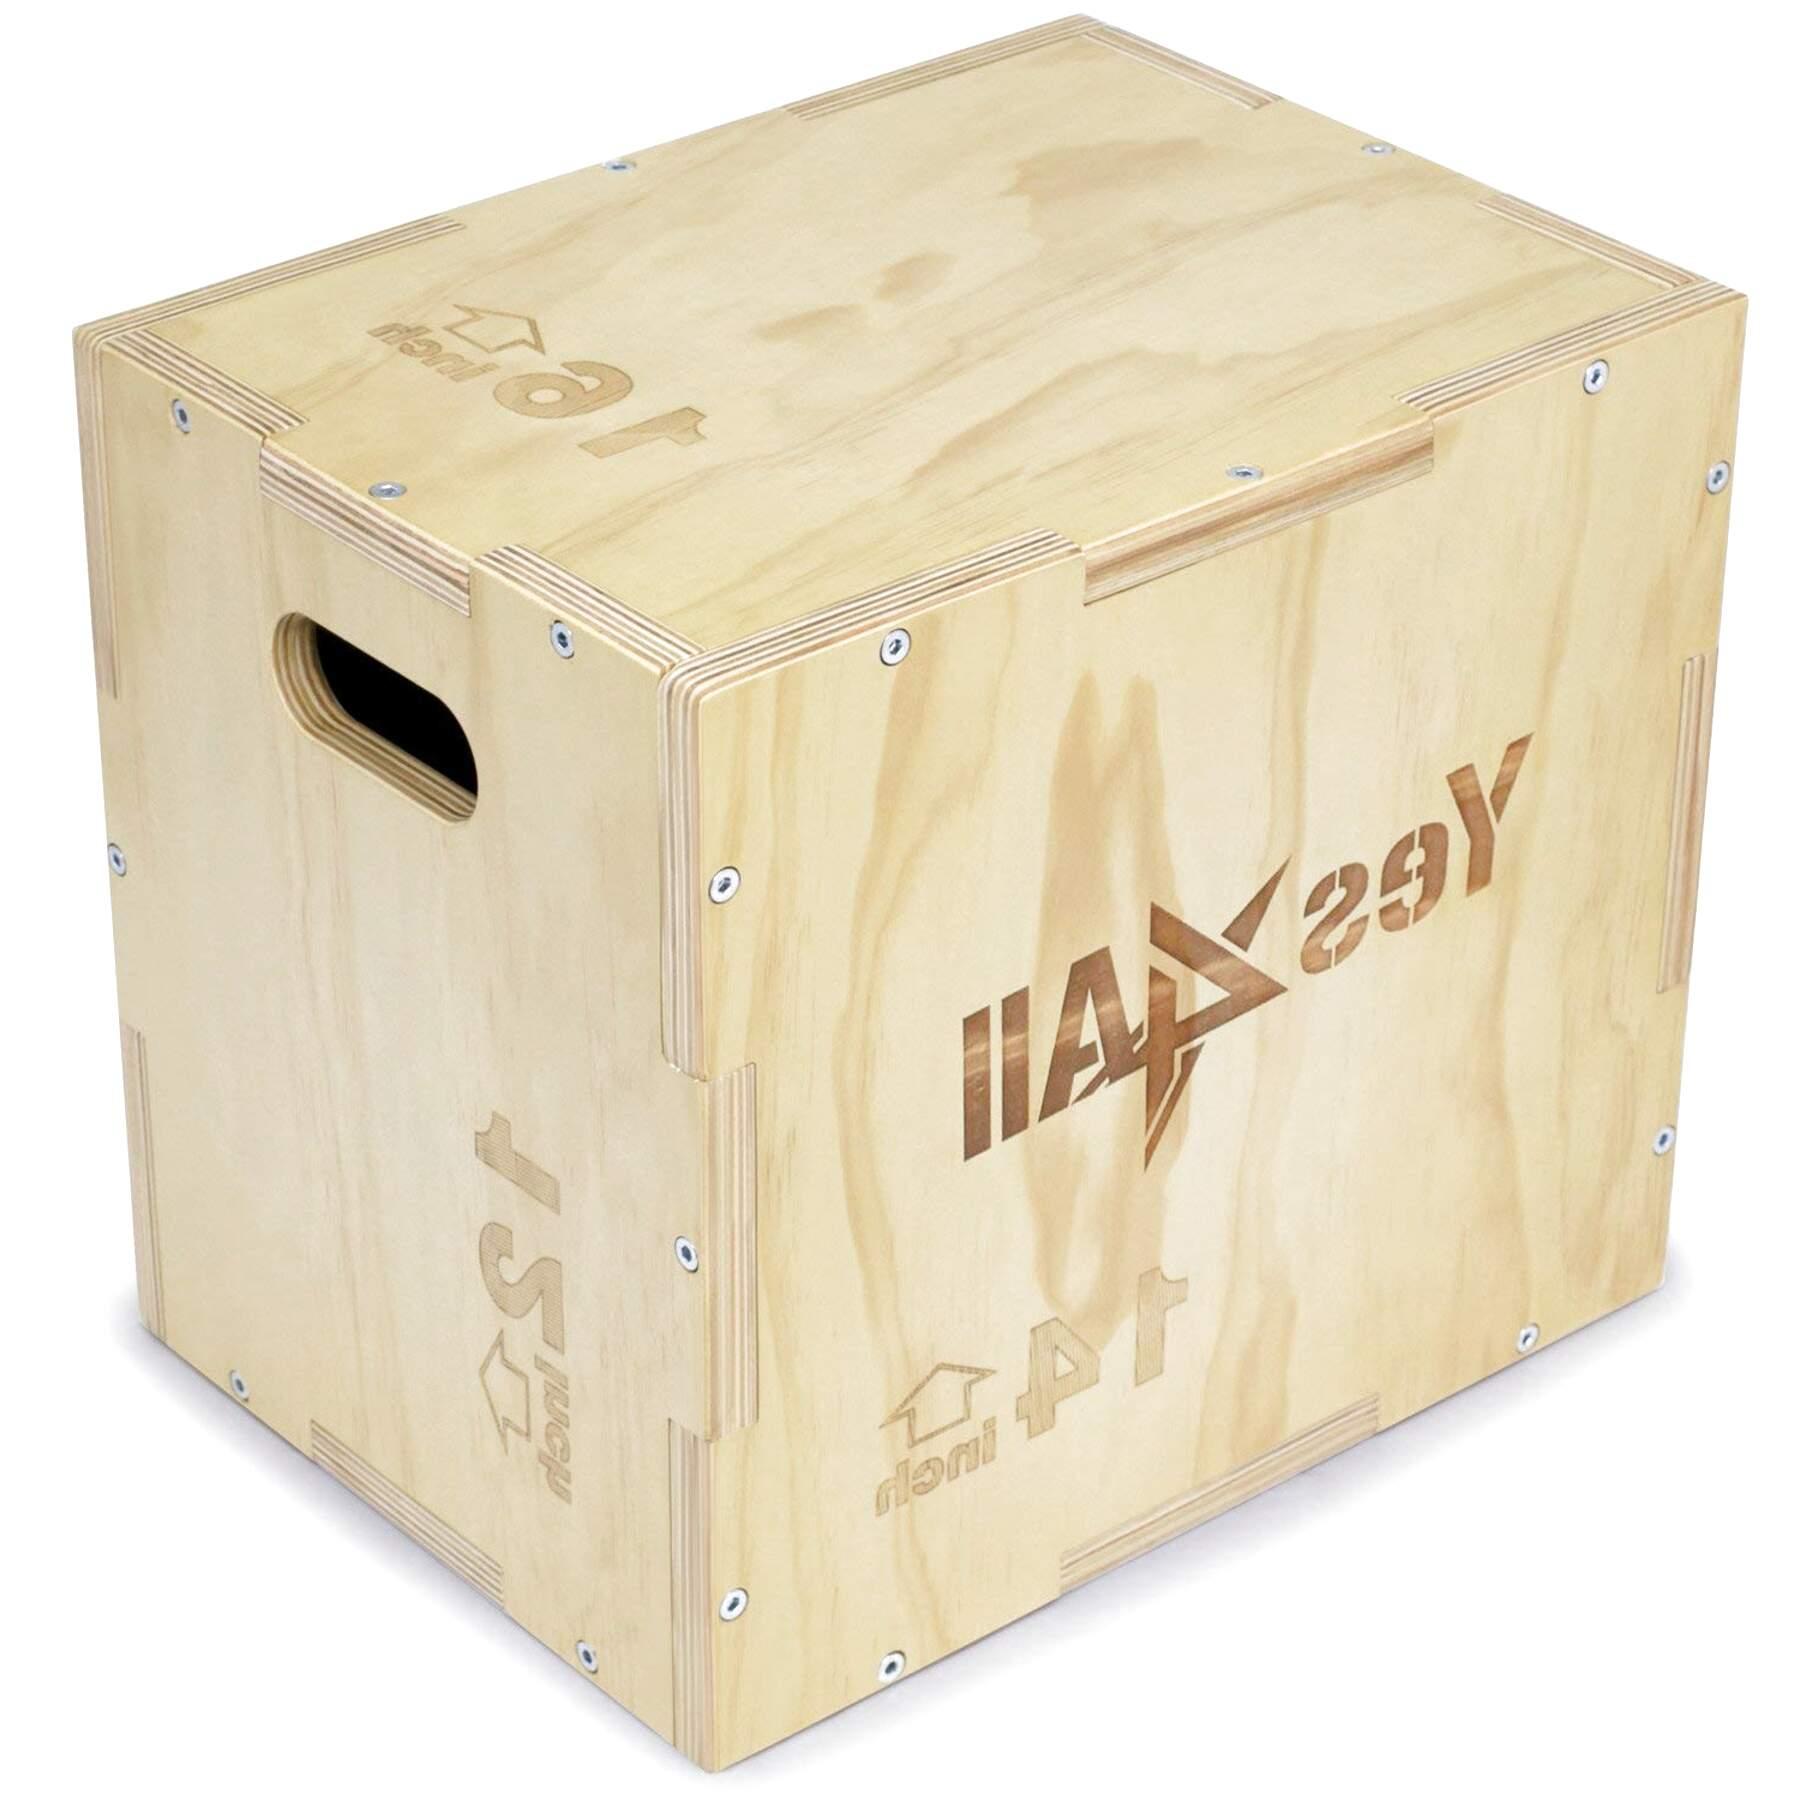 BuoQua 24 Inch Plyometric Box Exercise Plyometric Platform Jump Box Plyometric Training Jump Squat Box Fitness Box Set for Jump Training